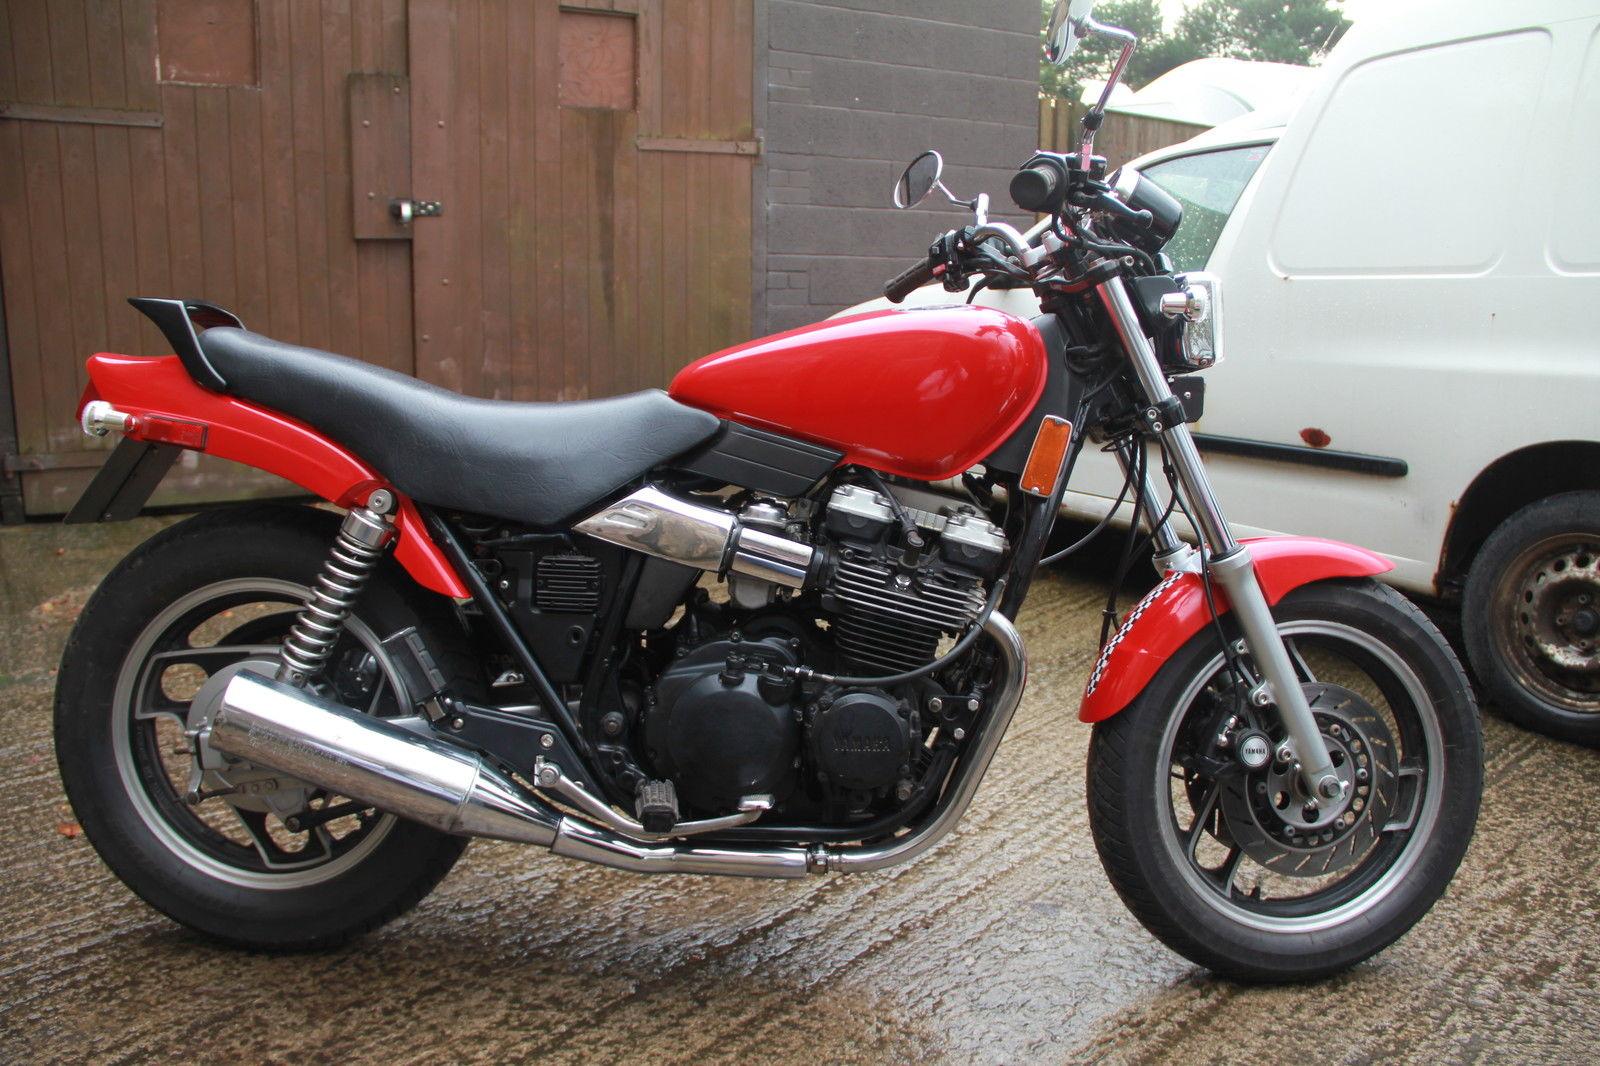 Yamaha Radian YX 600 Motorcycle 1986 For Sale Windsor